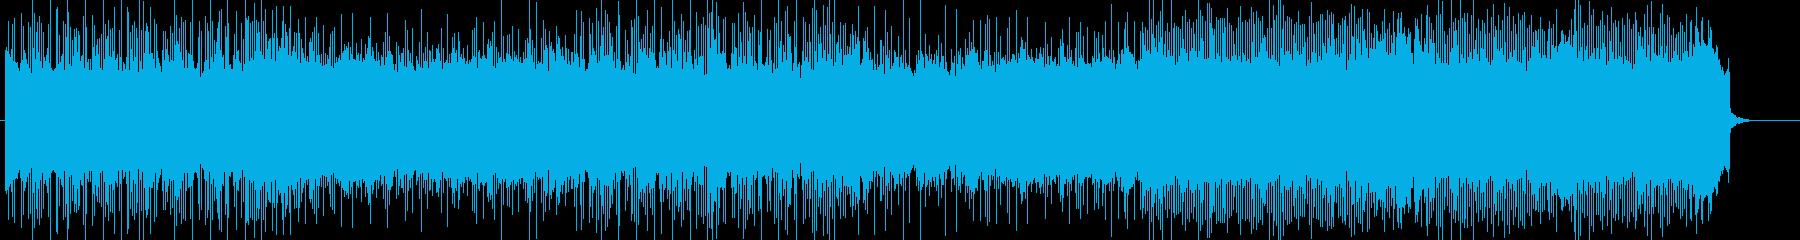 「HR/HM」「DARK」BGM56の再生済みの波形